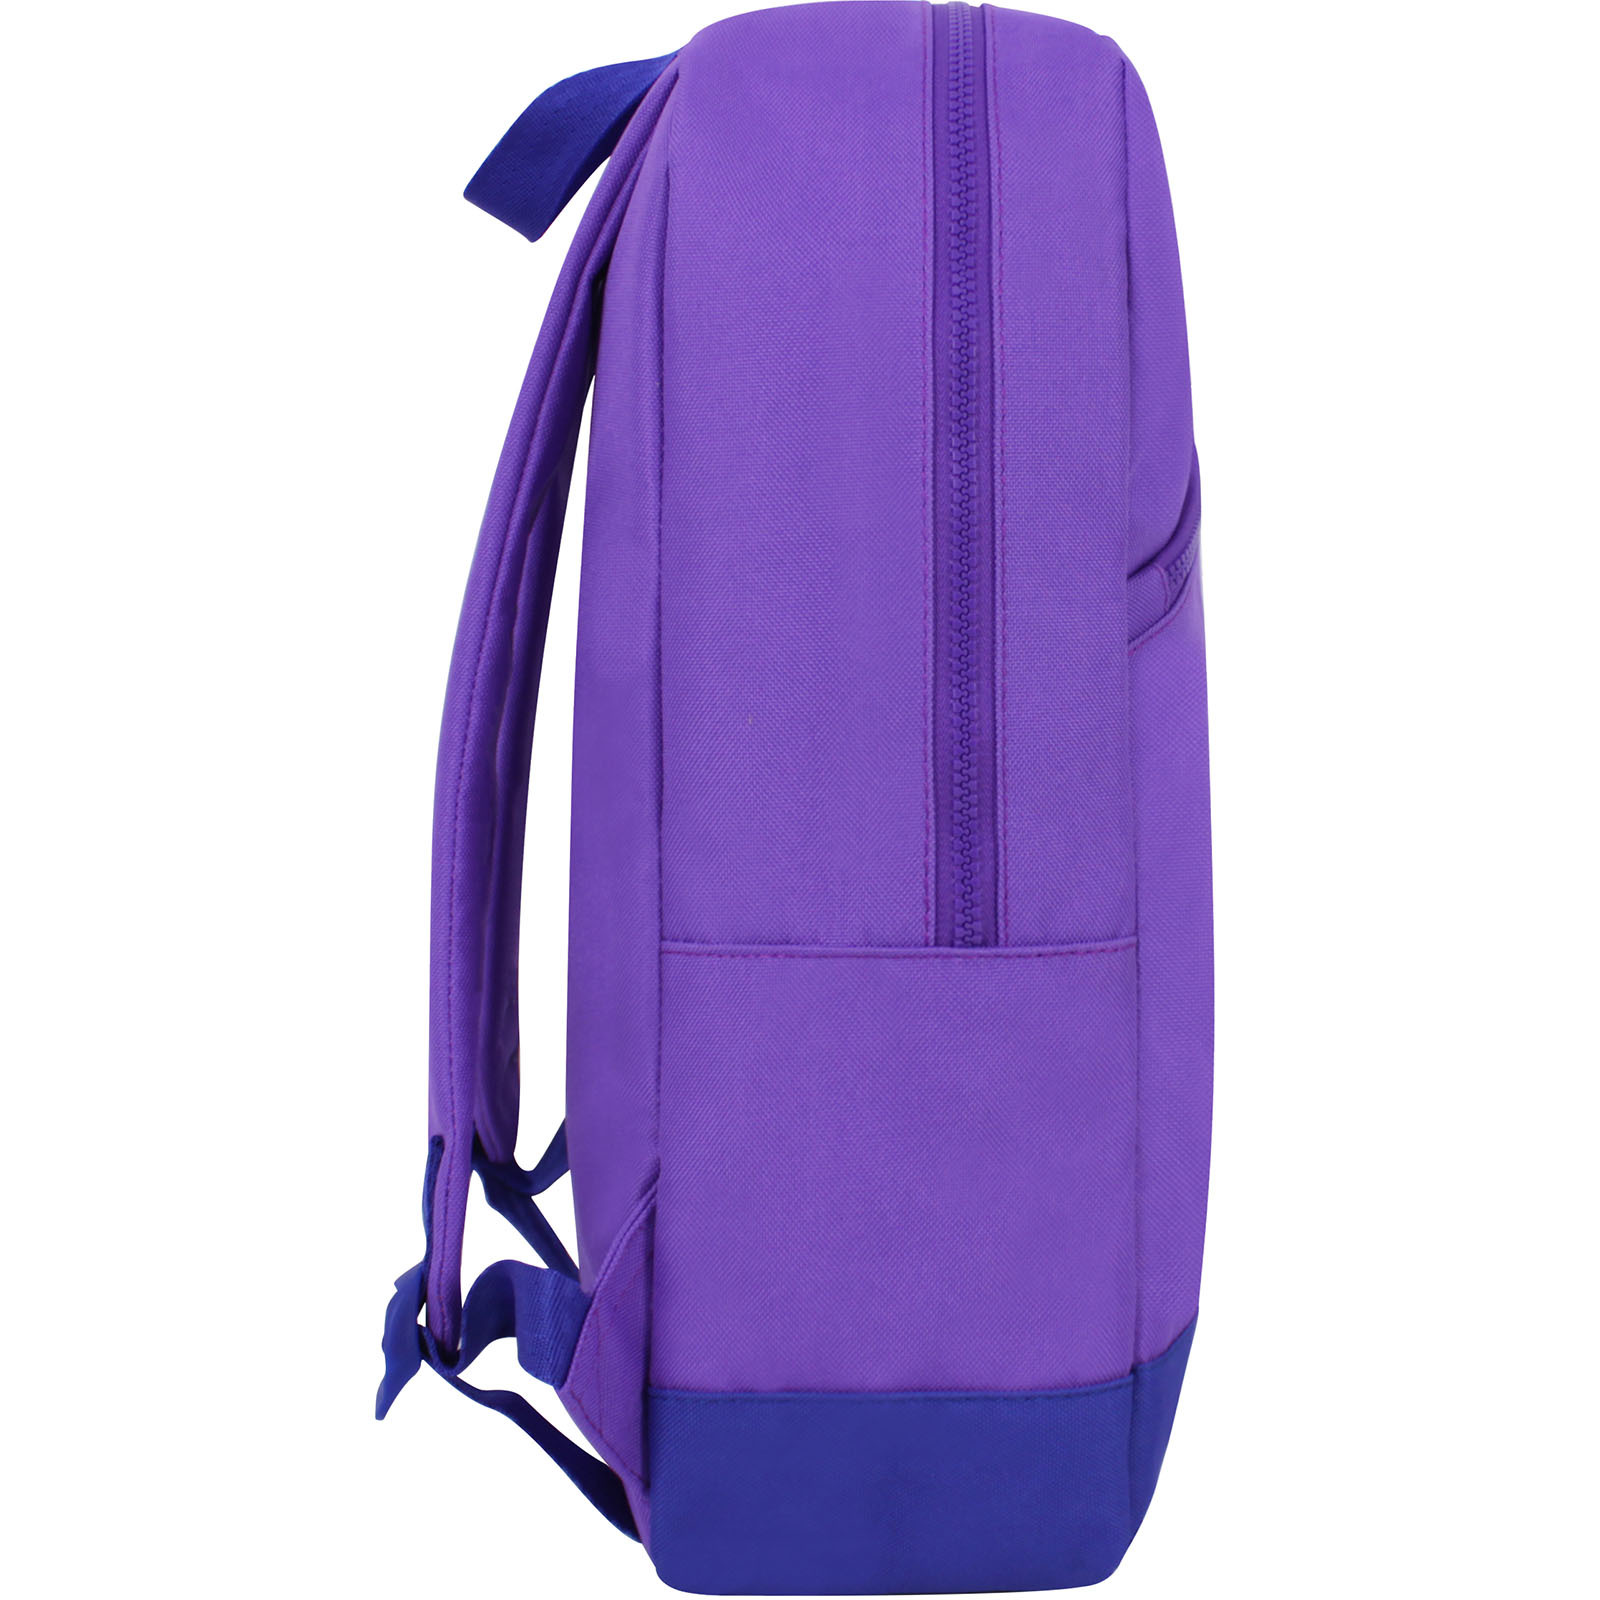 Рюкзак Bagland Amber 15 л. фиолетовый/электрик (0010466) фото 2